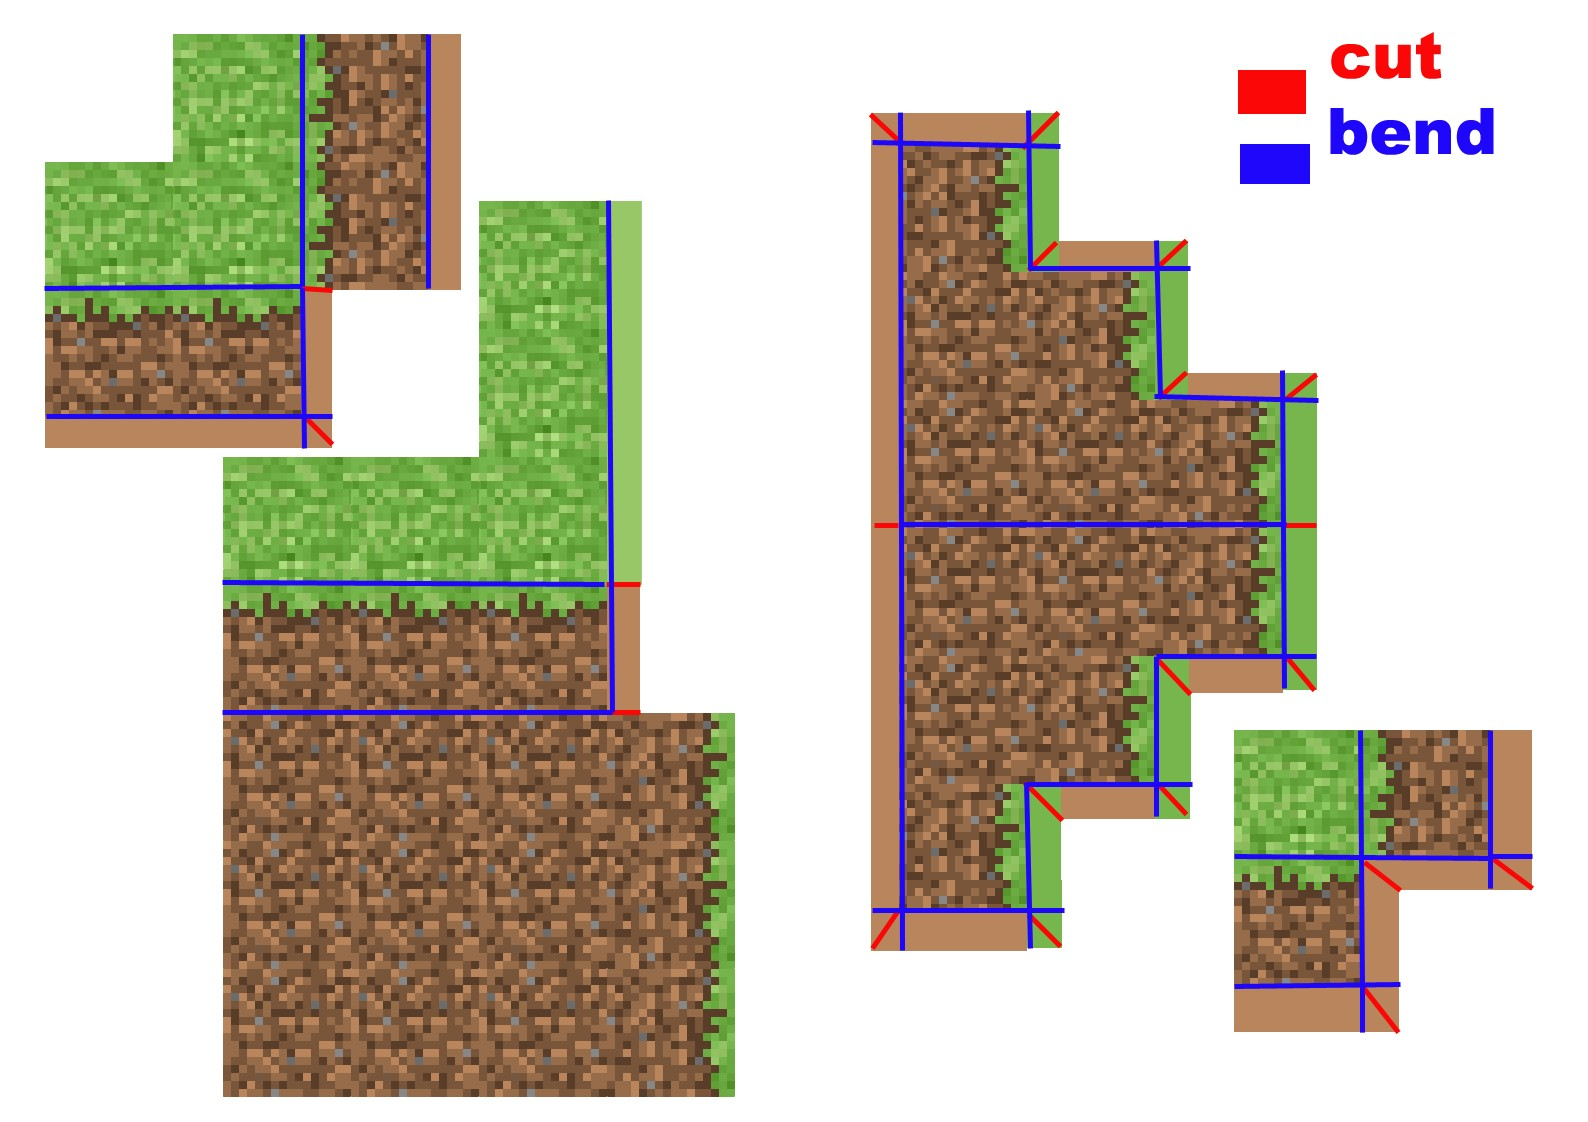 Minecraft Papercraft Bed Papercraft Grass Hill Ideas for A Minecraft Birthday